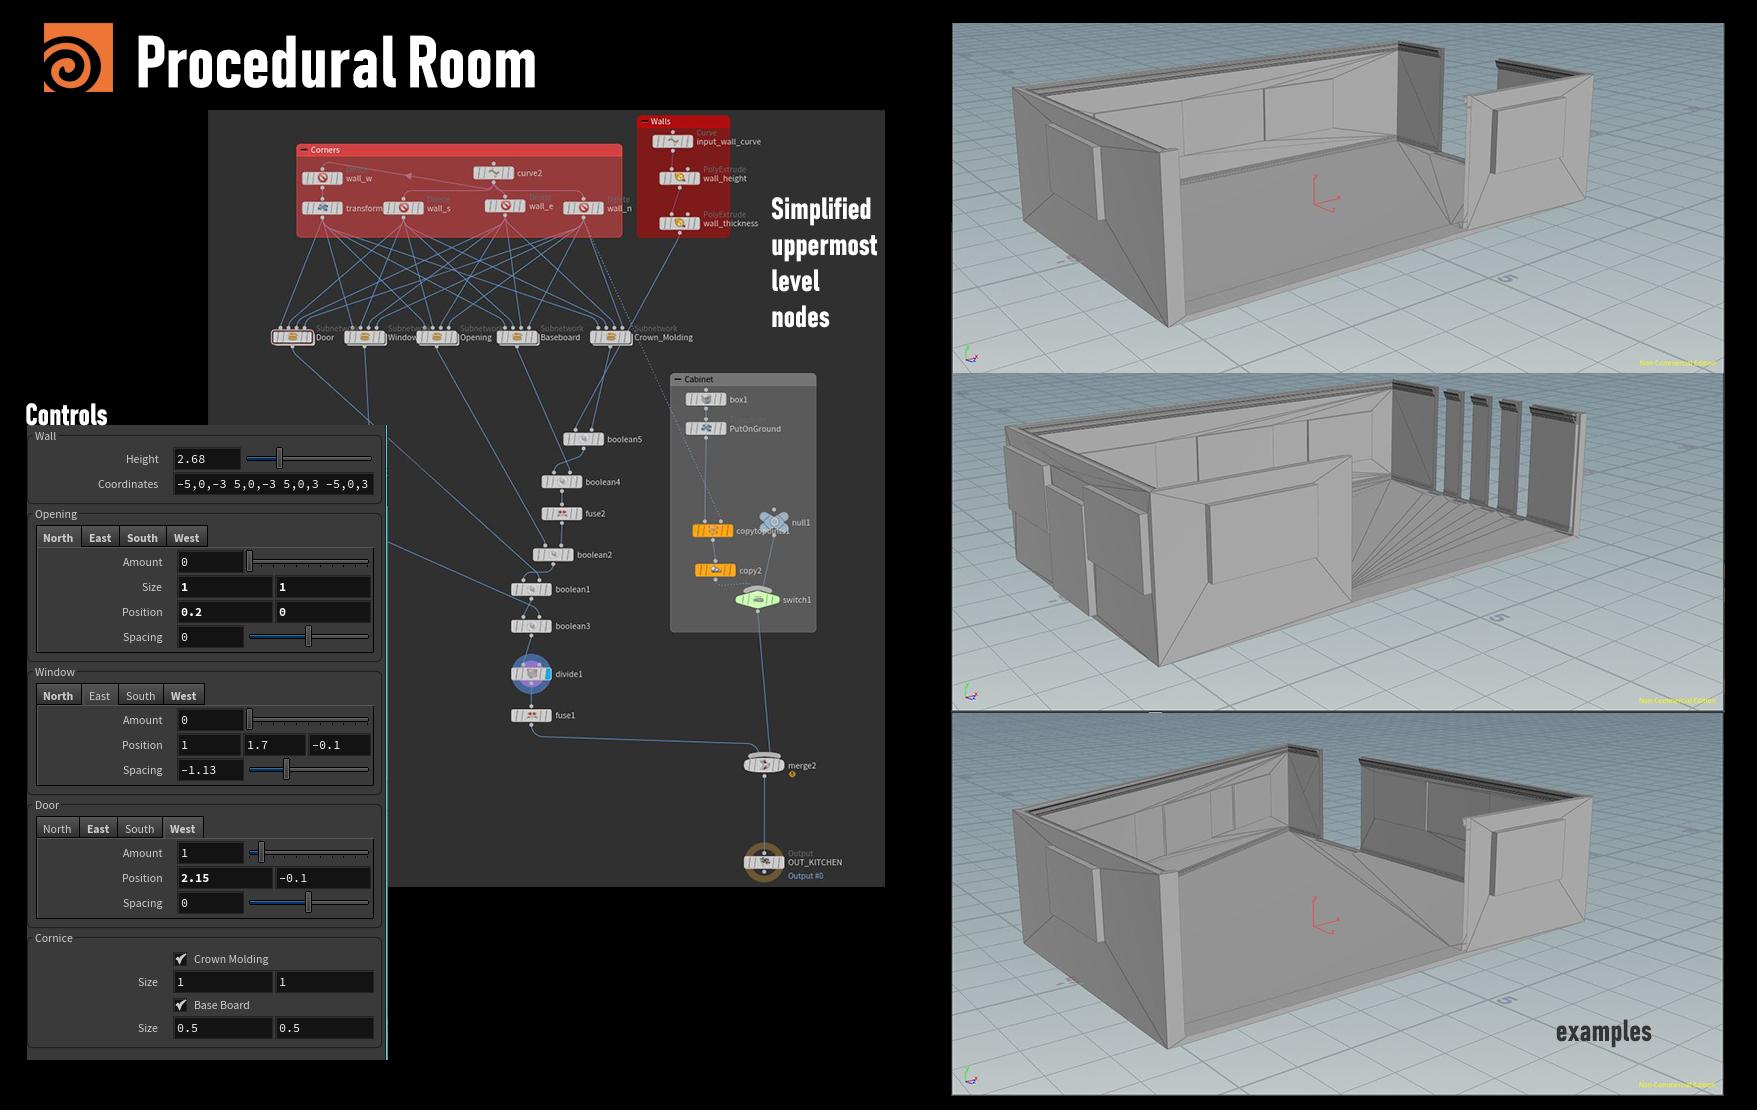 Procedural Room